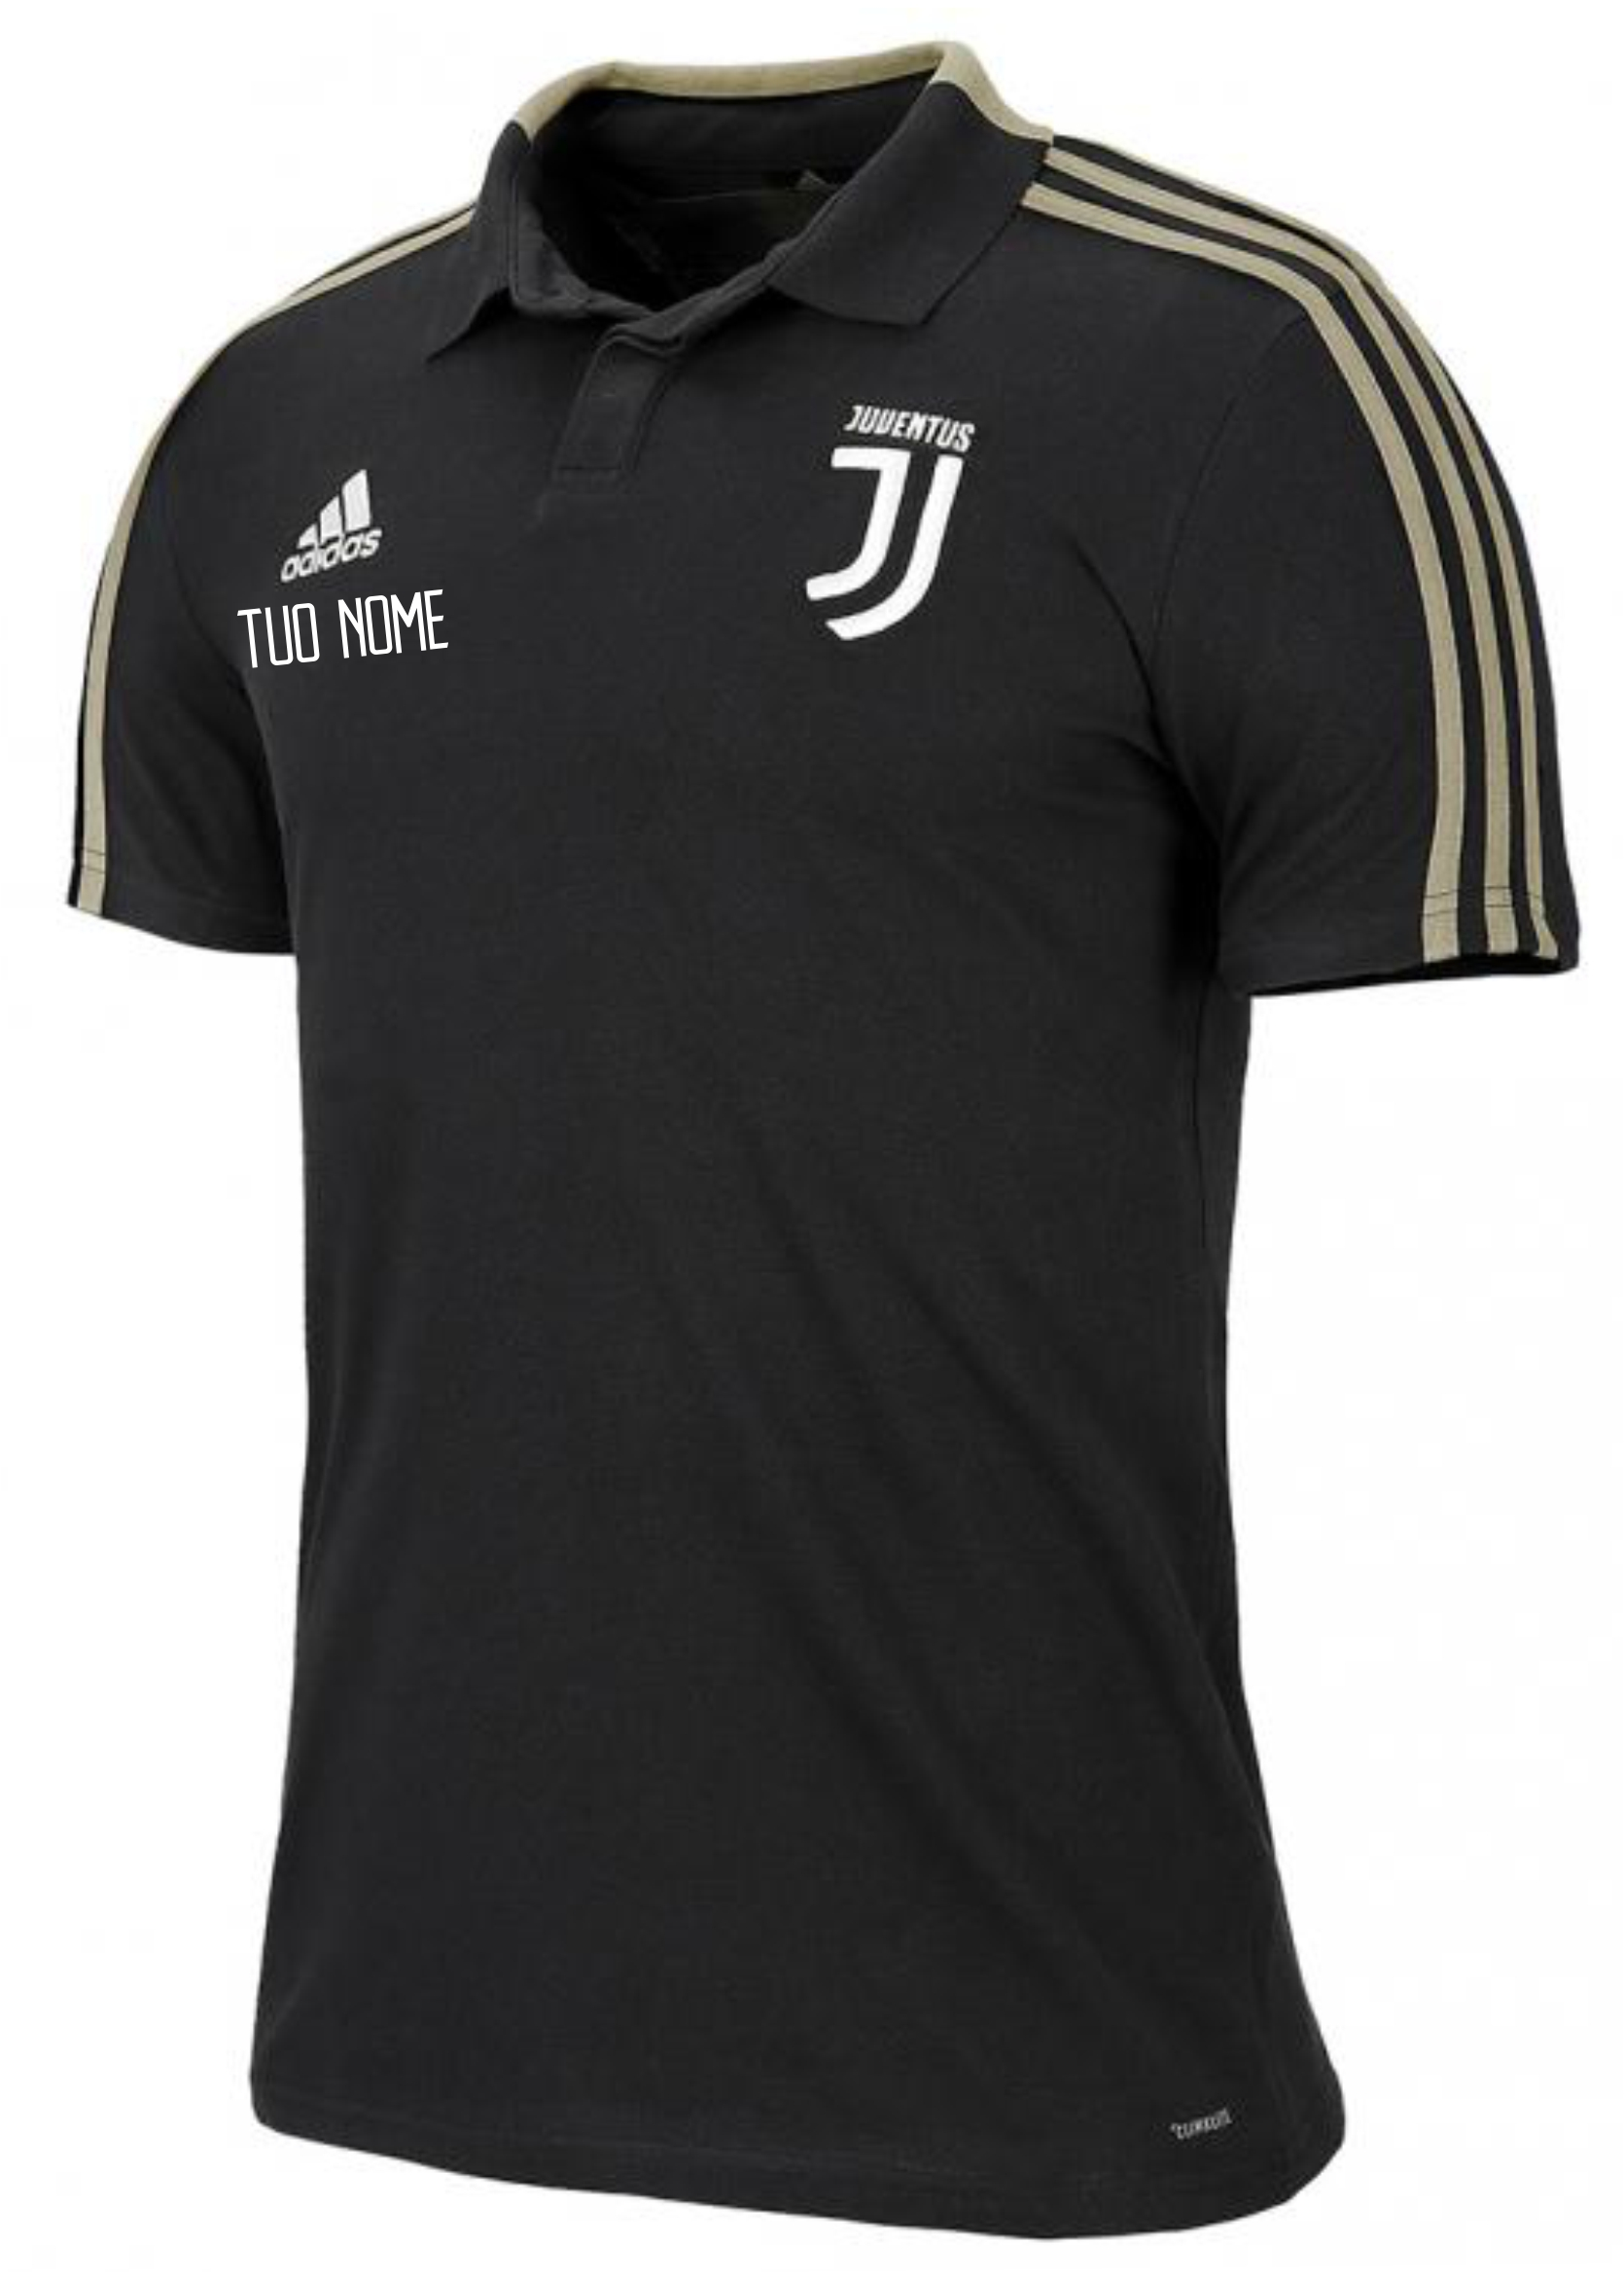 ddada90781 Polo Rappresentanza Nera F.C. Juventus 2018/2019